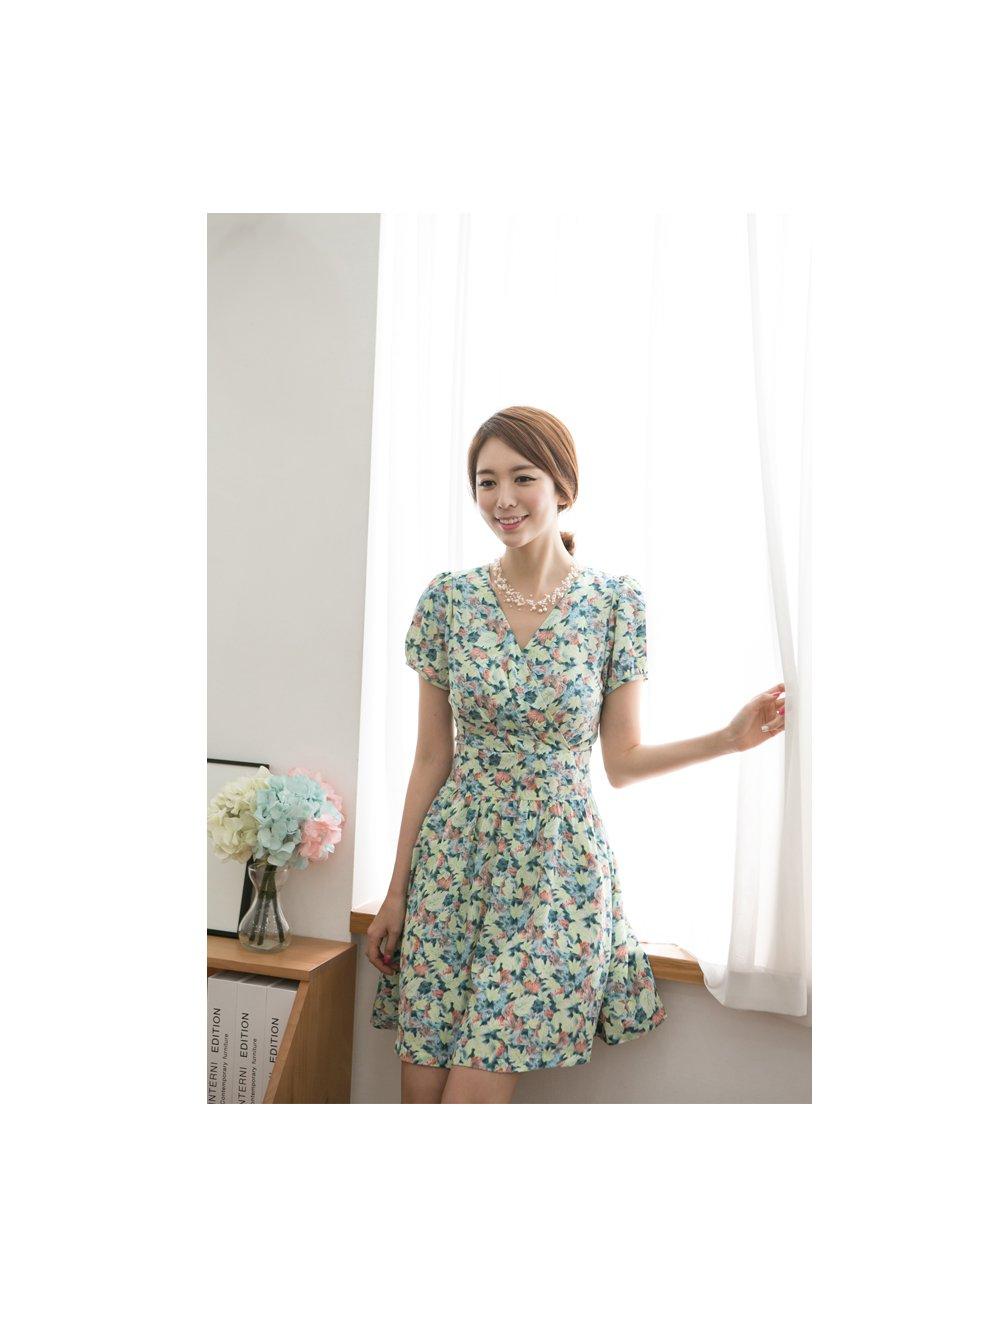 caolalaopodemeimei_ode 女士绿色短袖雪纺连衣裙 m码 363659009